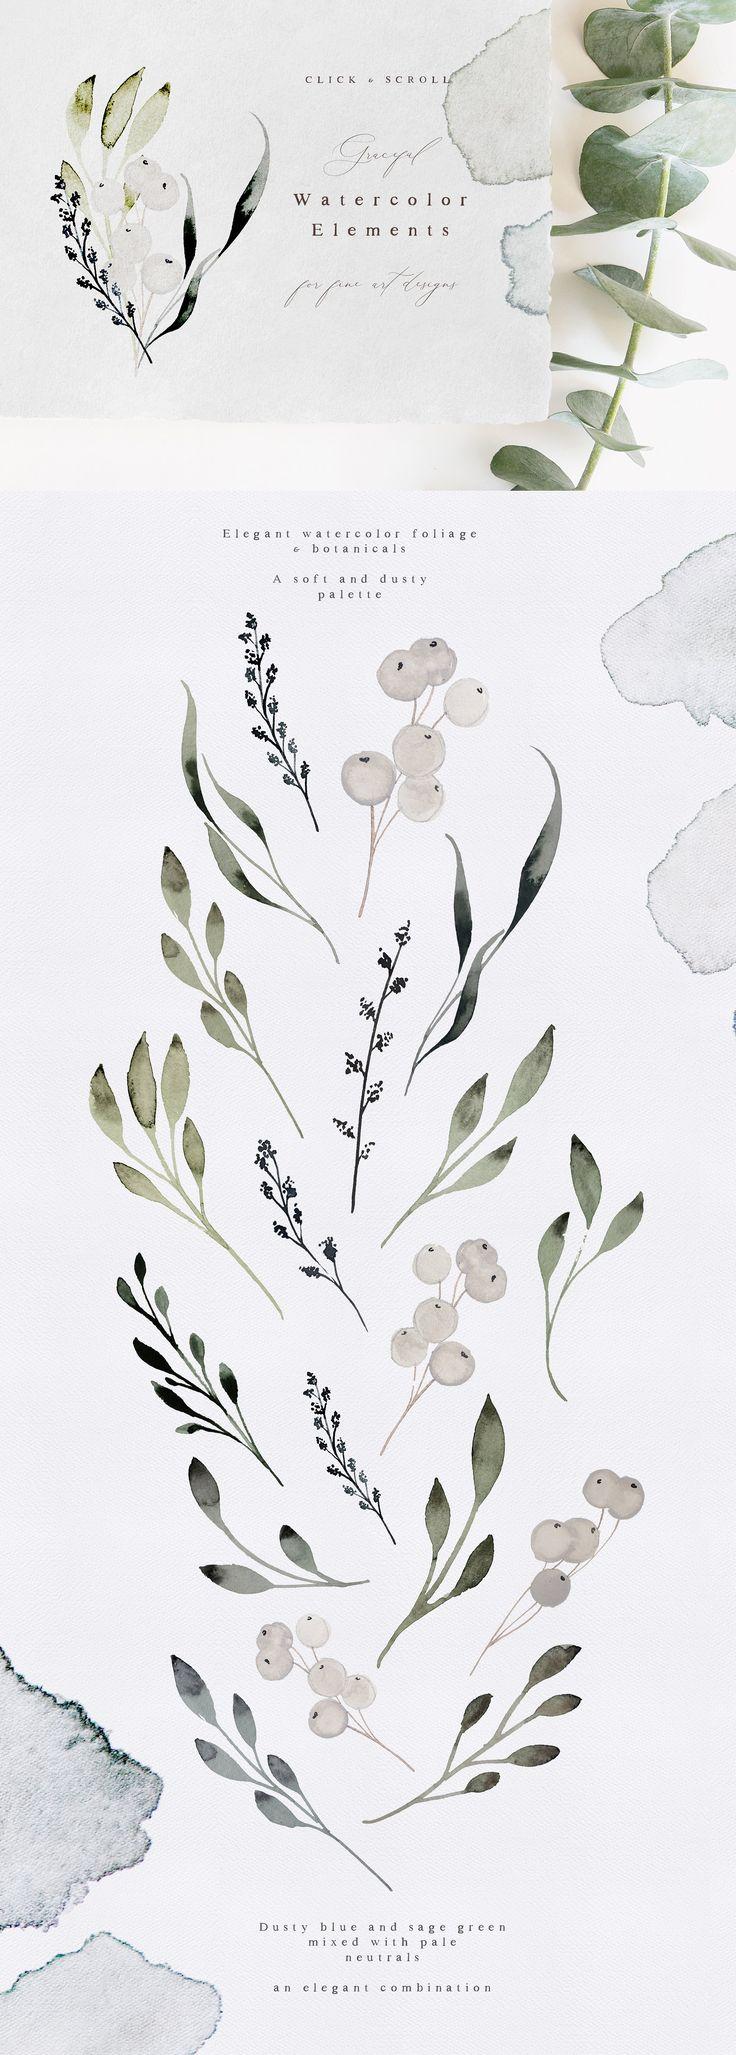 Hazel - Artisan Flowers & Watercolor by Laras Wonderland on @creativemarket